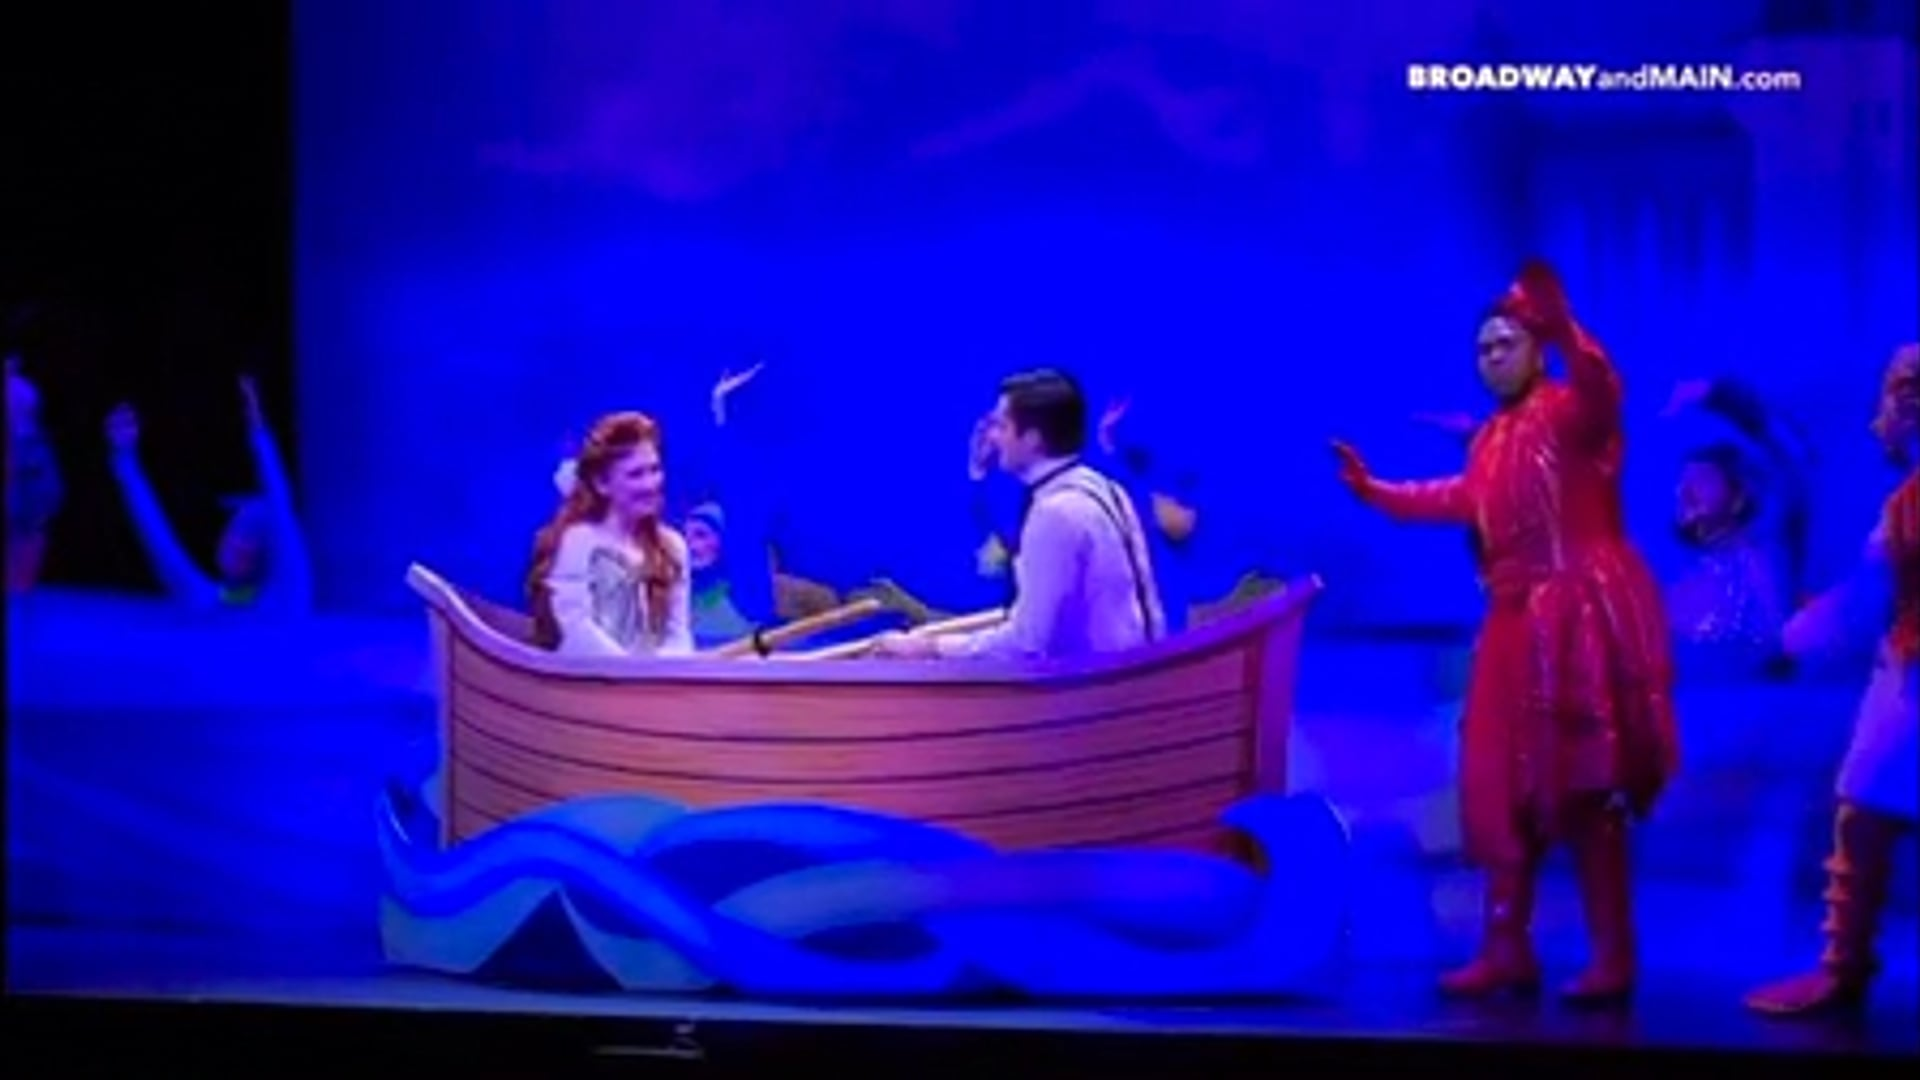 Little Mermaid Interview (Broadway & Main)